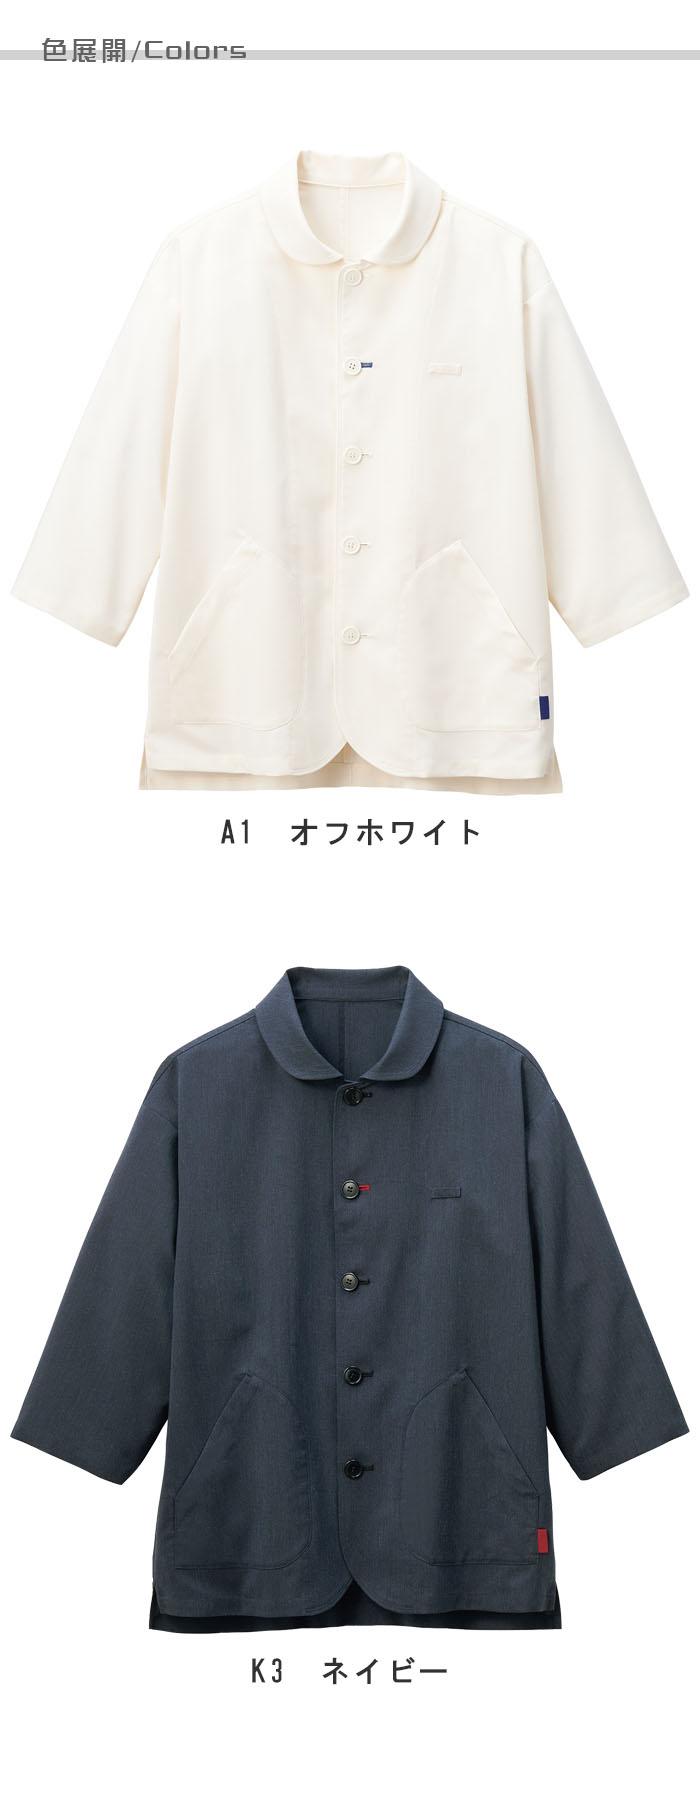 HACCP対応 柔らかいナチュラルな印象 ショップコート【2色】男女兼用  商品色展開説明